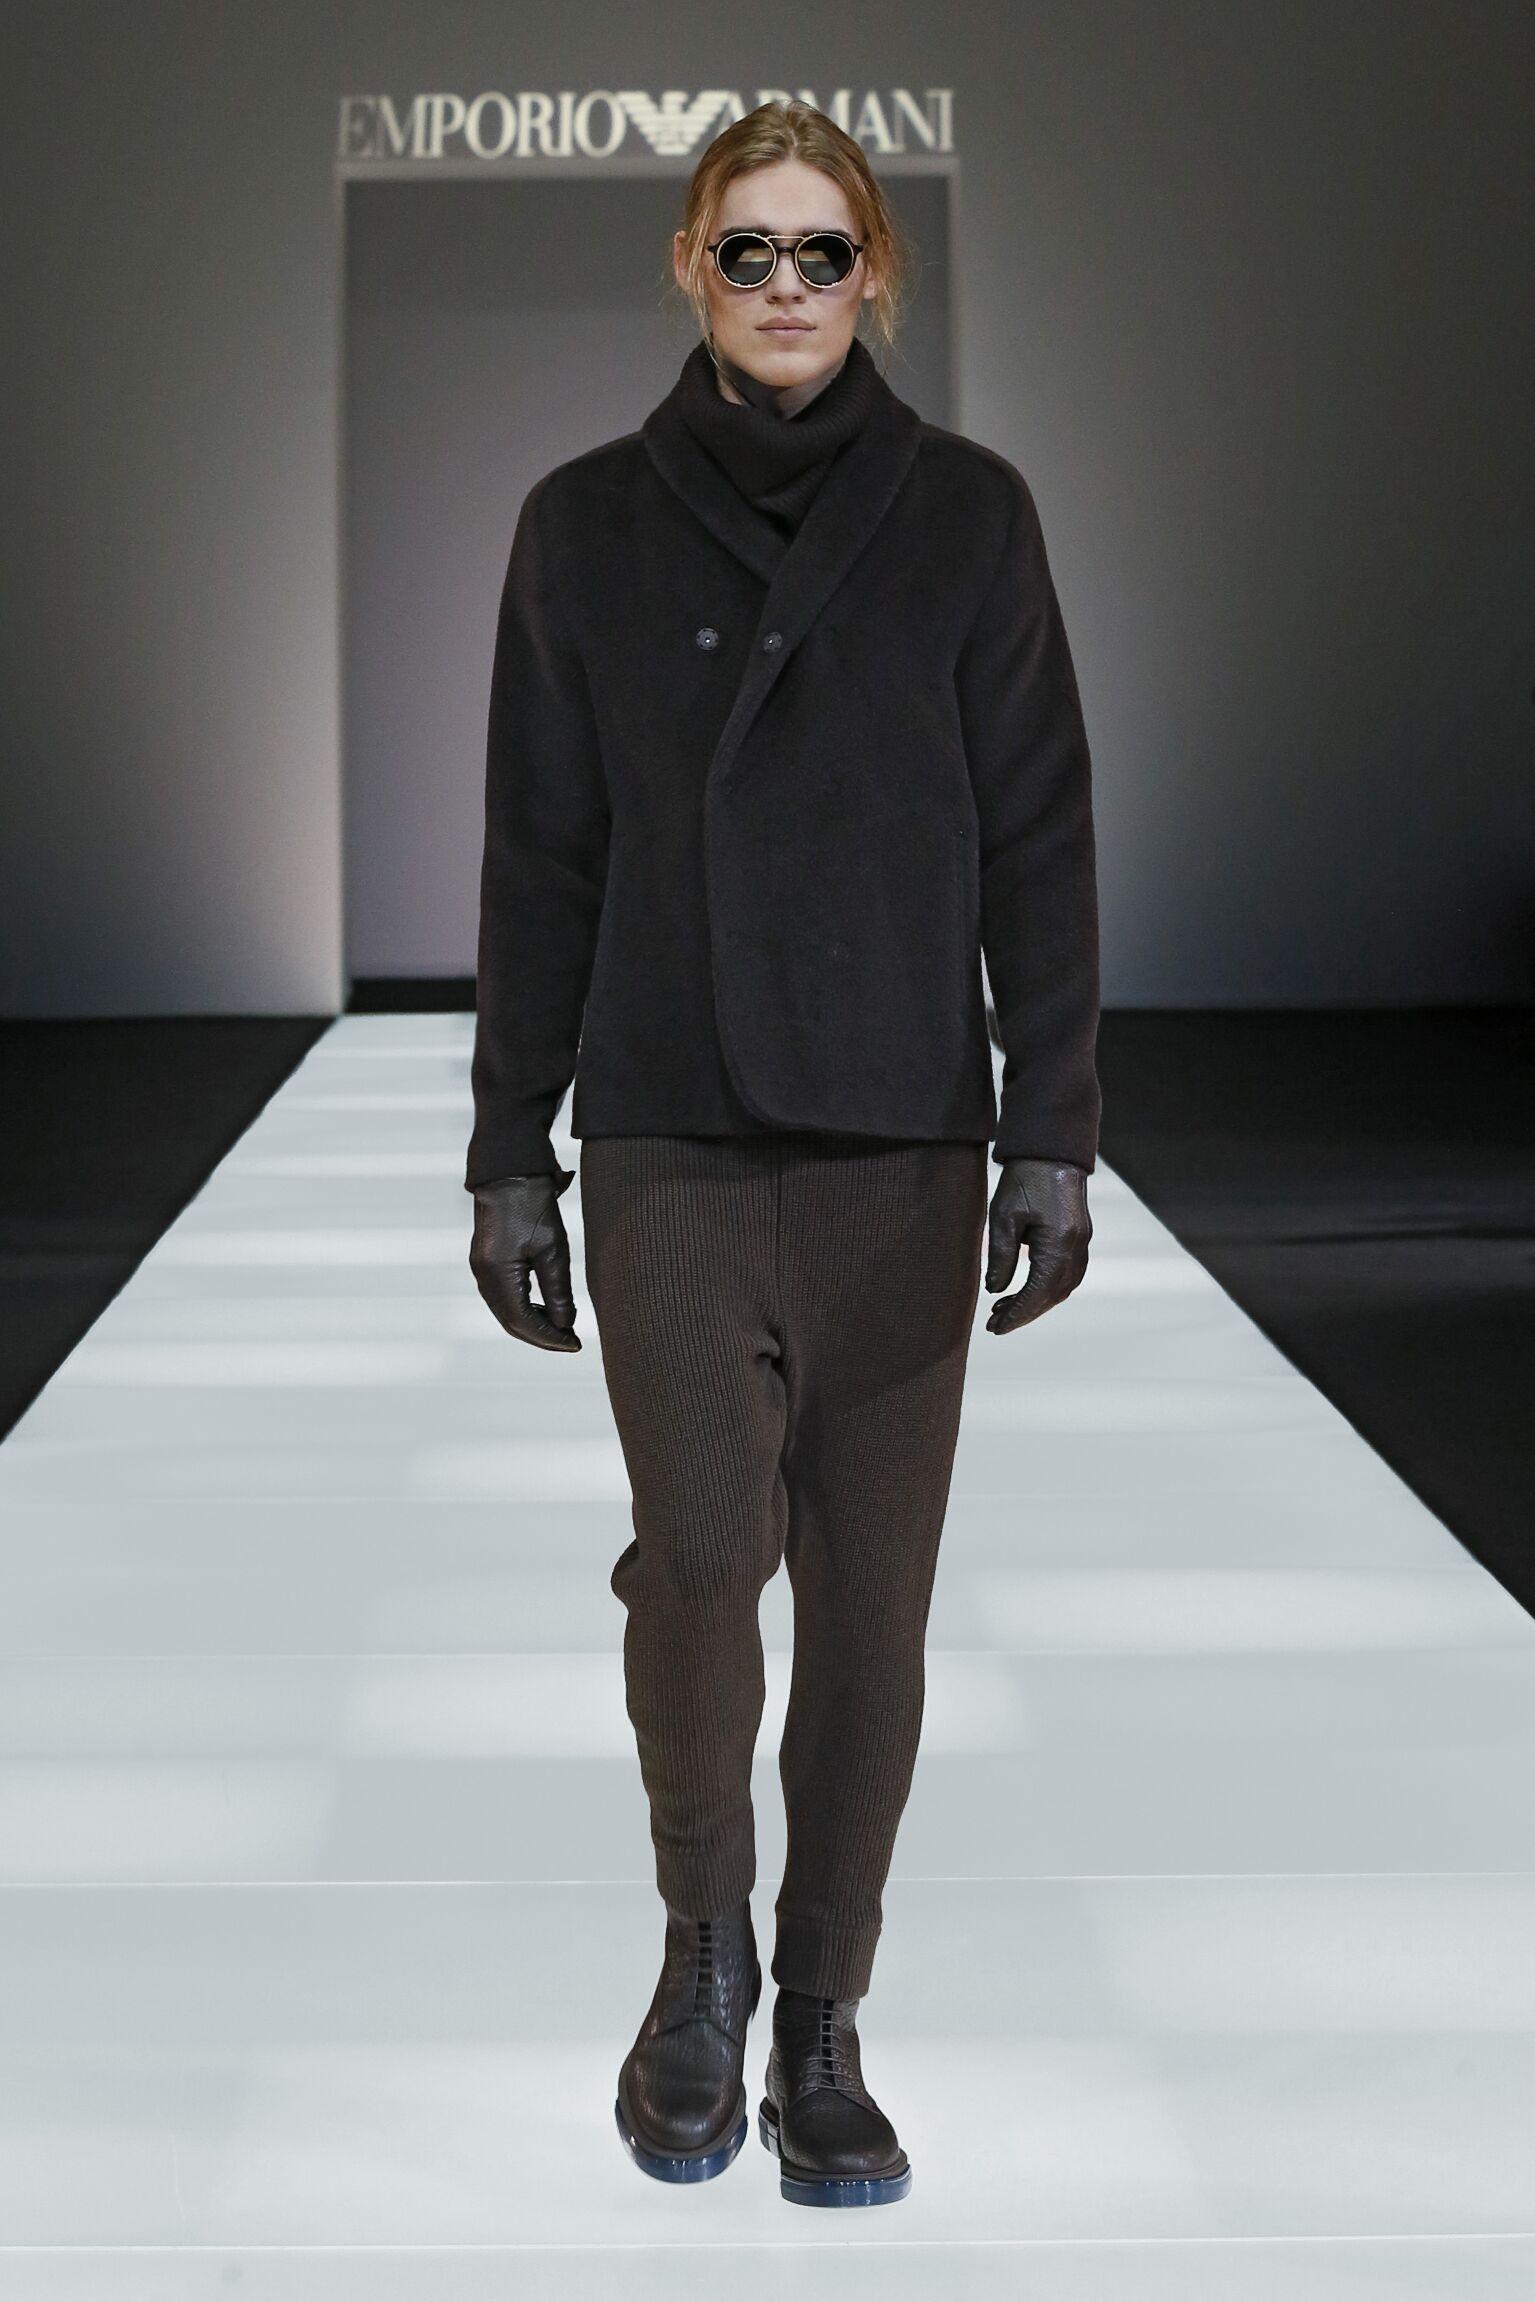 Fashion Man Model Emporio Armani Collection Catwalk